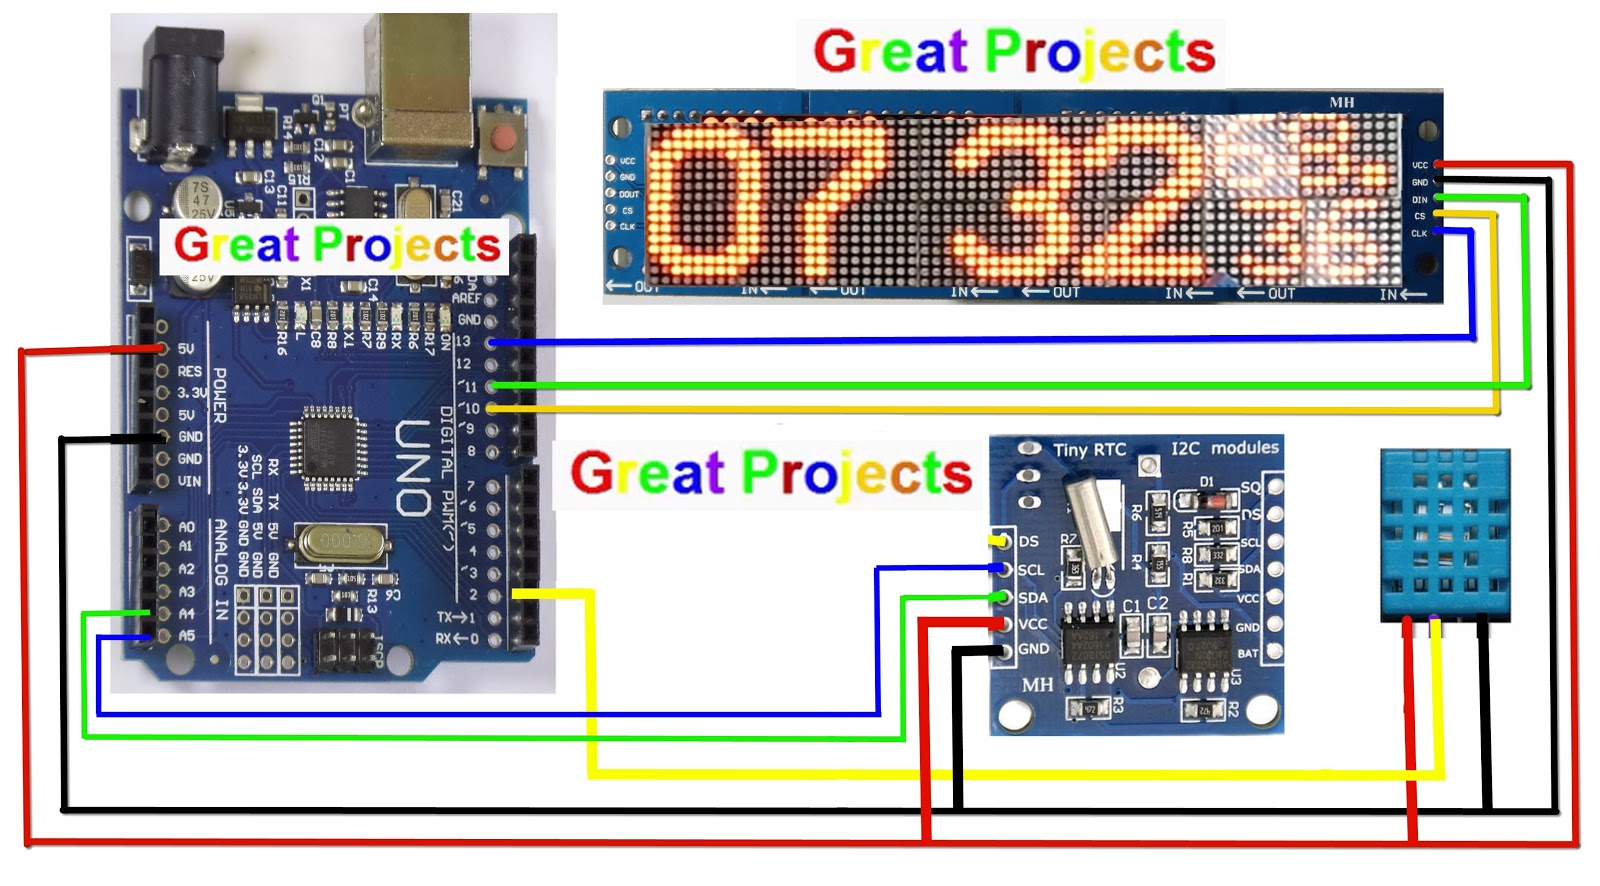 Great Projects: MAX7219 DHT11 DS1307 16x64 matrix clock Arduino